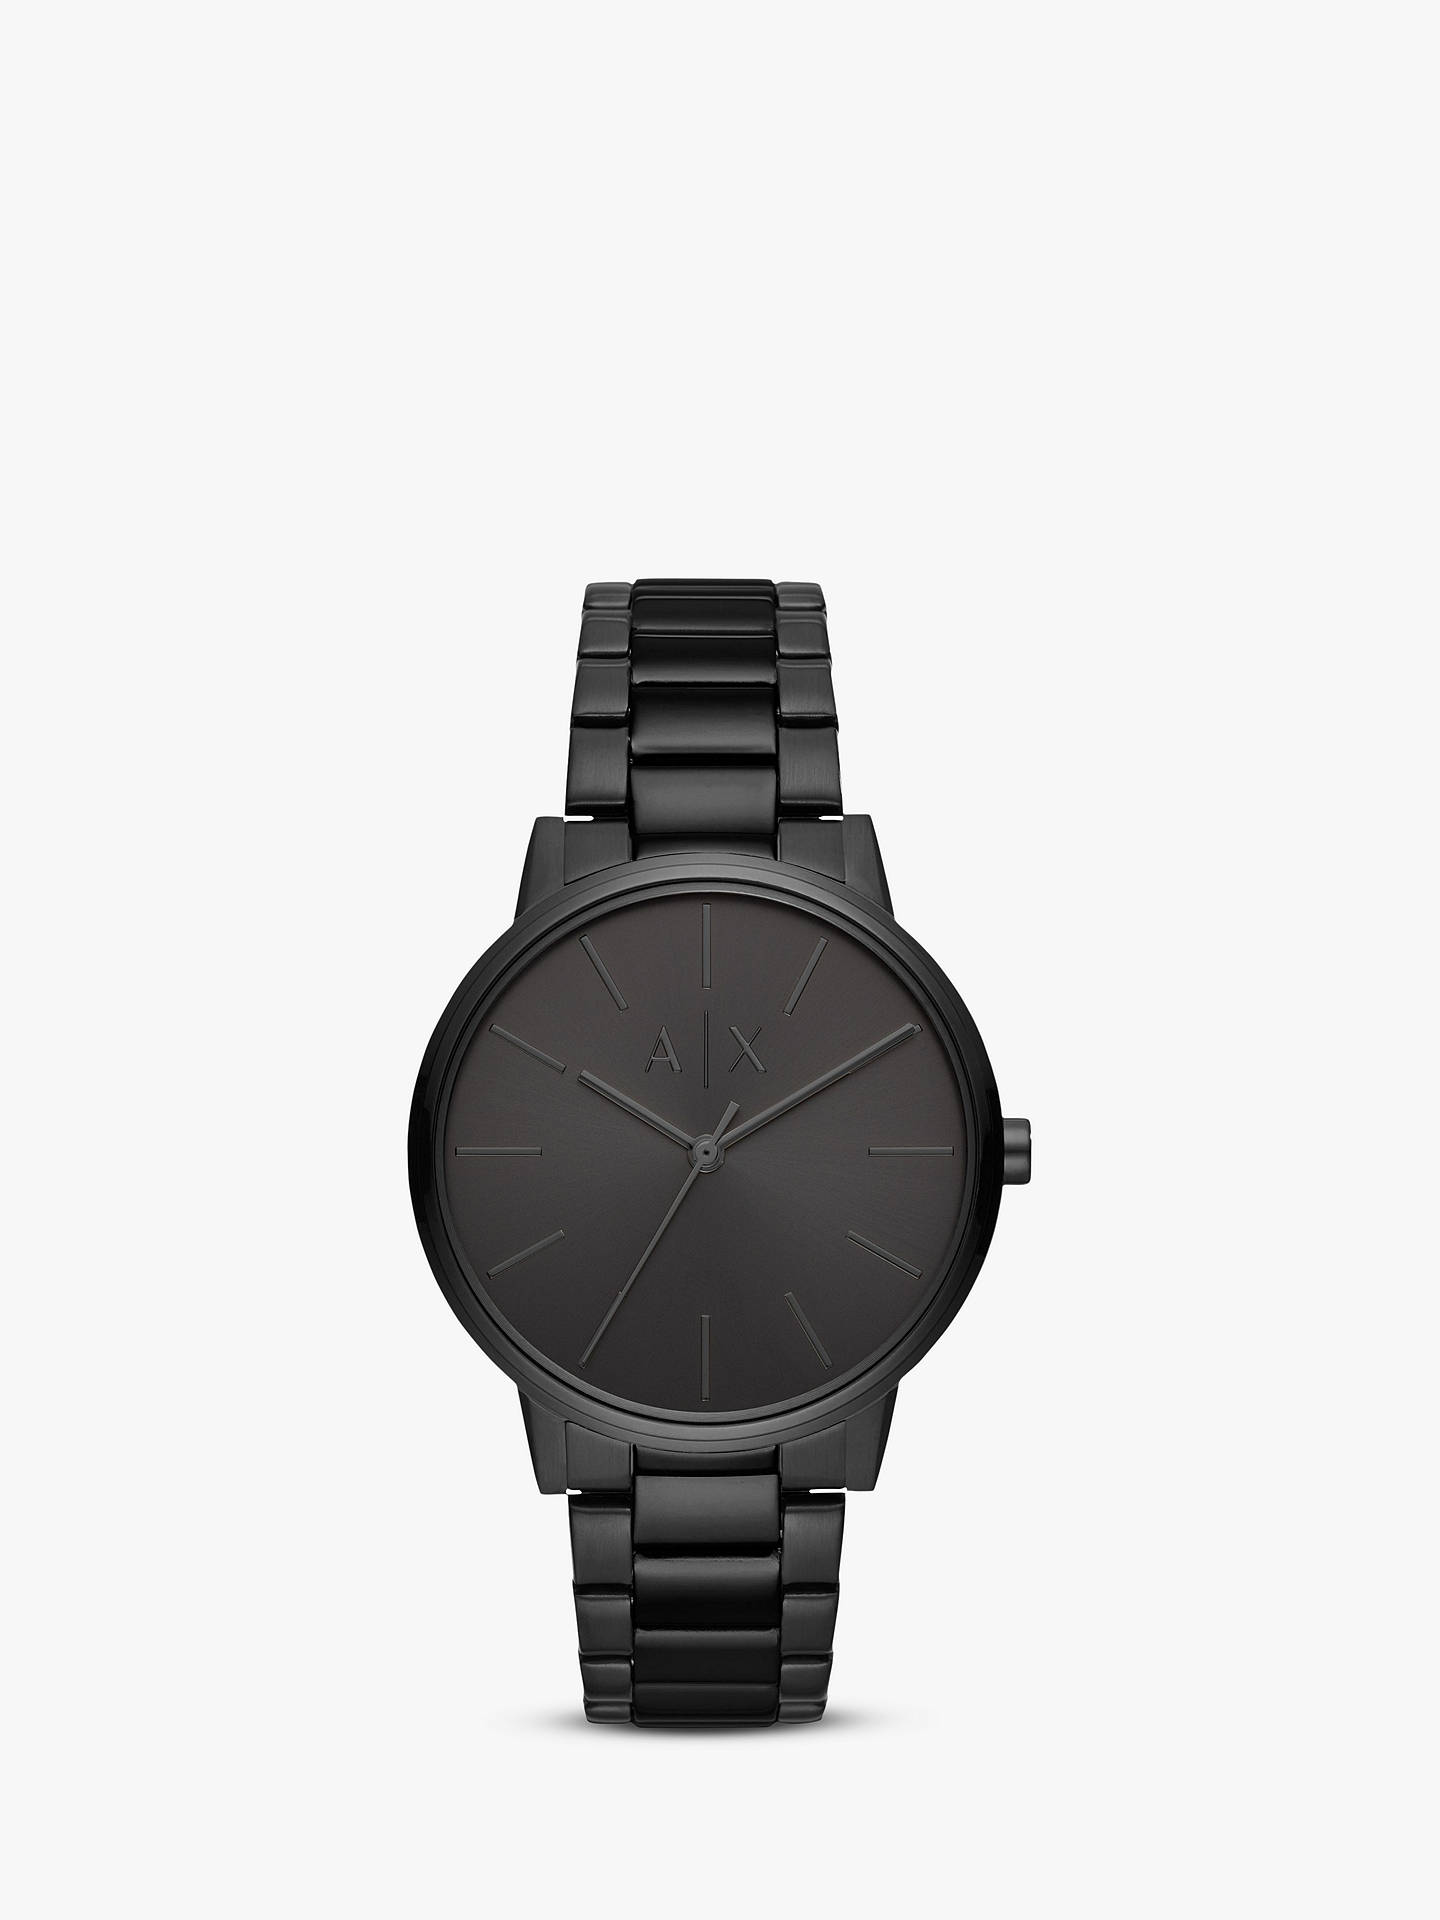 b5b6edb6293d Armani Exchange Men s Bracelet Strap Watch at John Lewis   Partners